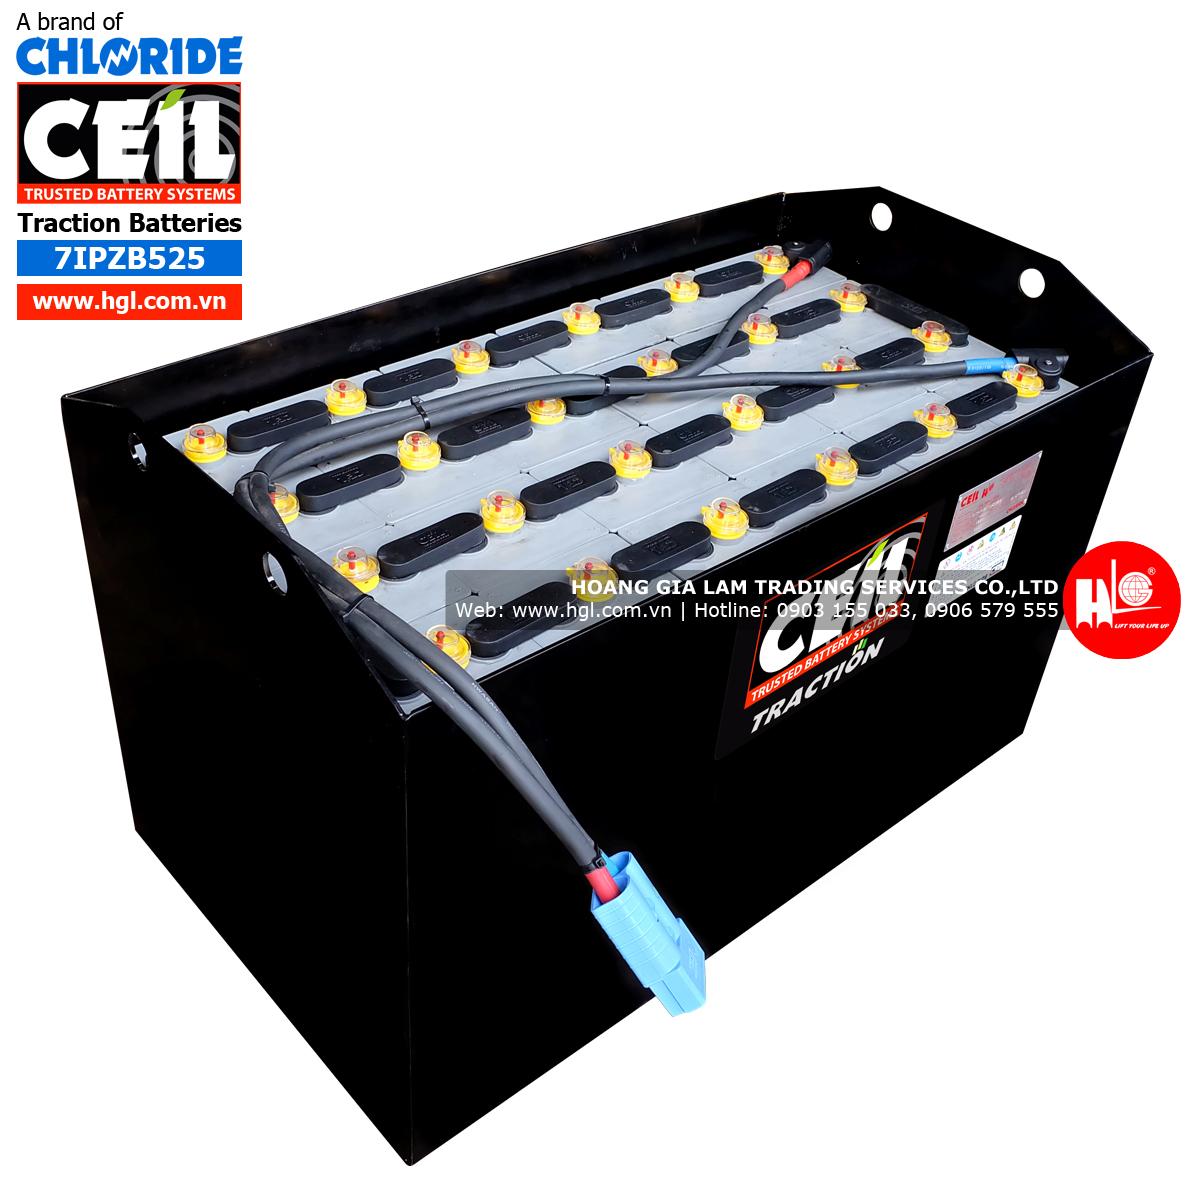 binh-dien-xe-nang-chloride-ceil-525ah-48v-7IPZB525-nap-vang